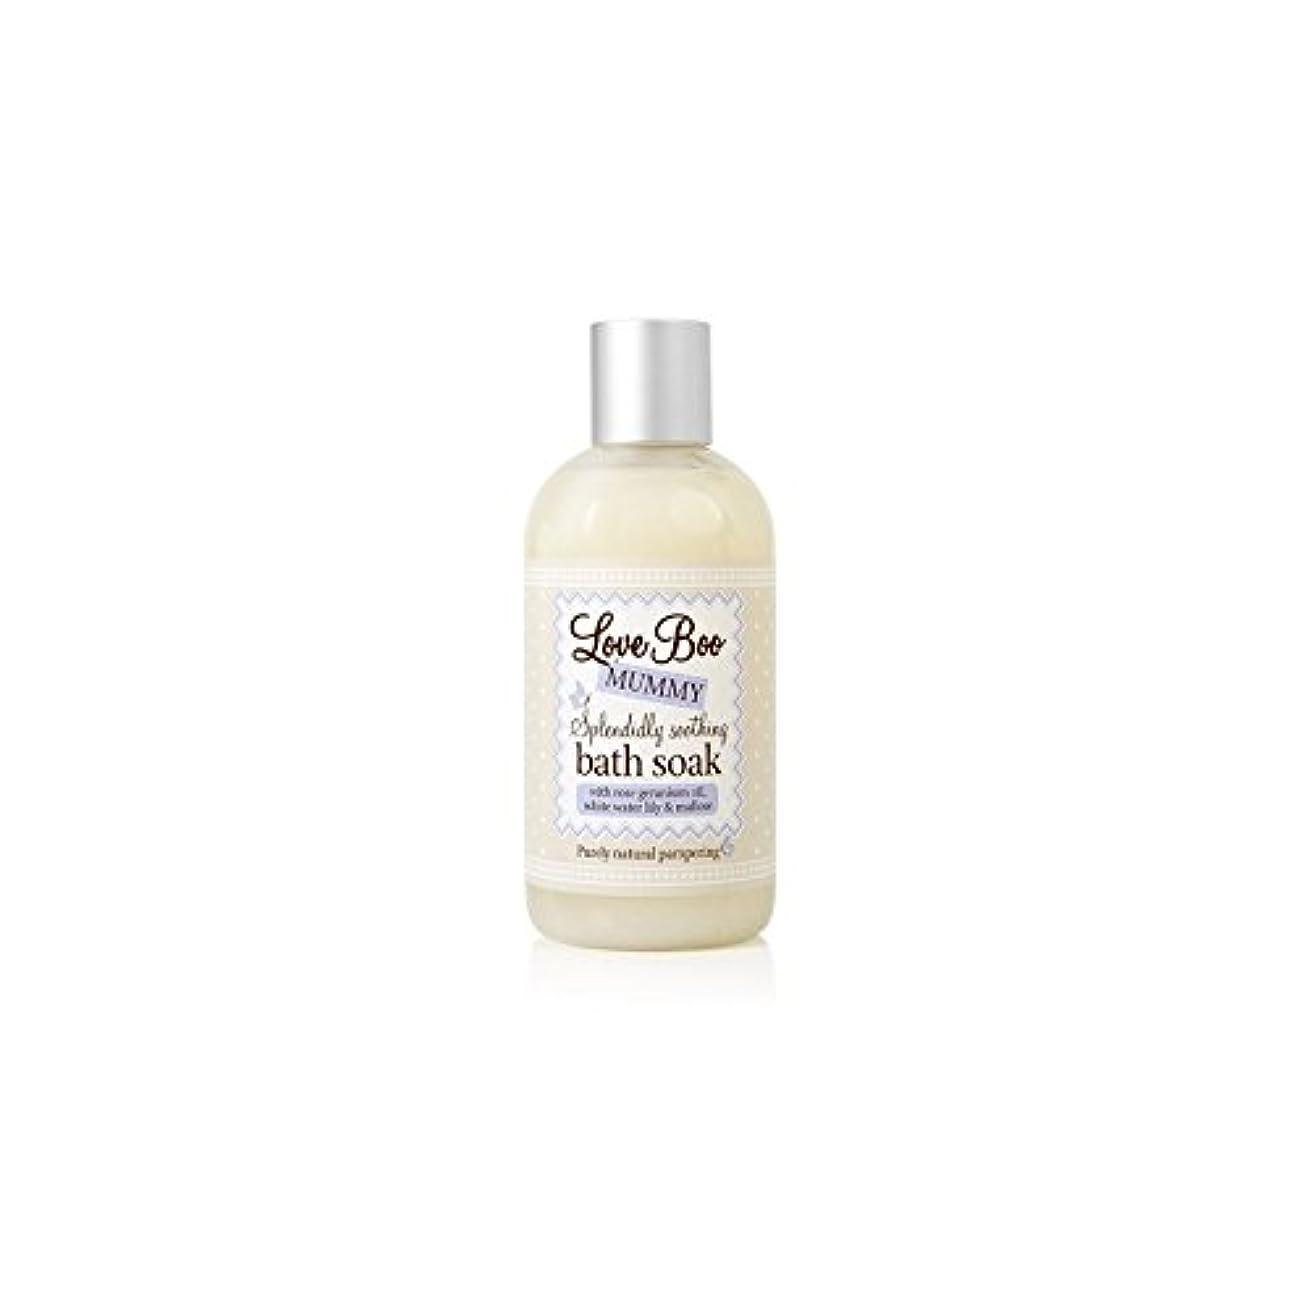 Love Boo Splendidly Soothing Bath Soak (250ml) (Pack of 6) - ブーイング見事なだめるようなお風呂が大好き(250ミリリットル)を浸します x6 [並行輸入品]